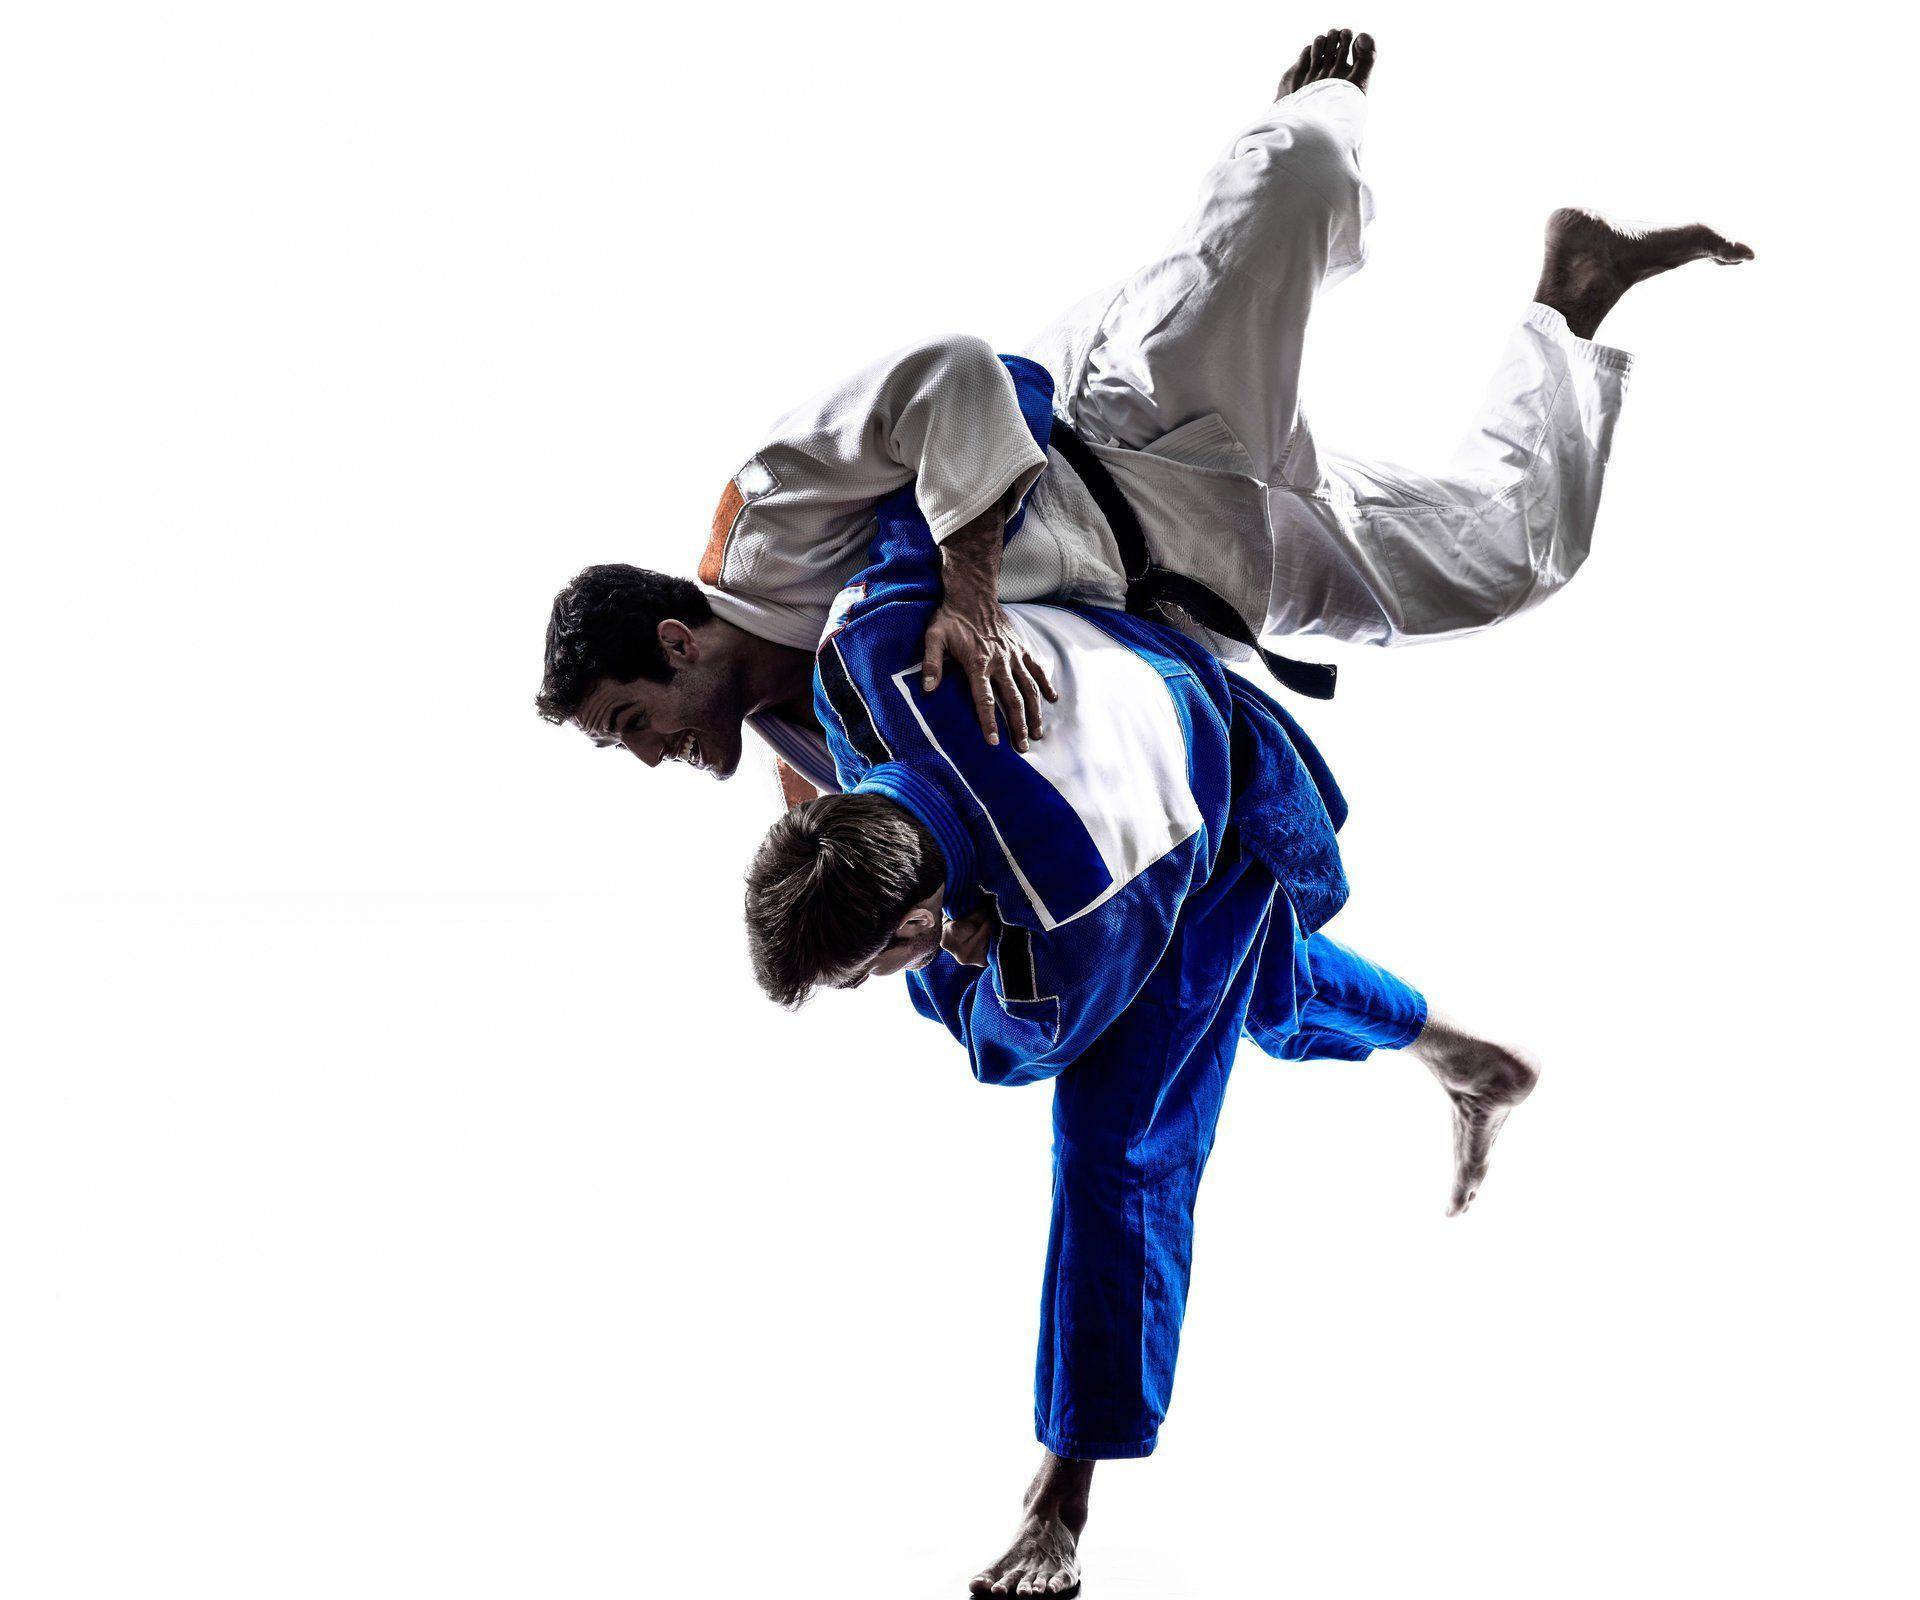 Resultado De Imagen Para Judo Wallpaper Judo Jiujitsu Desenho Artes Marciais